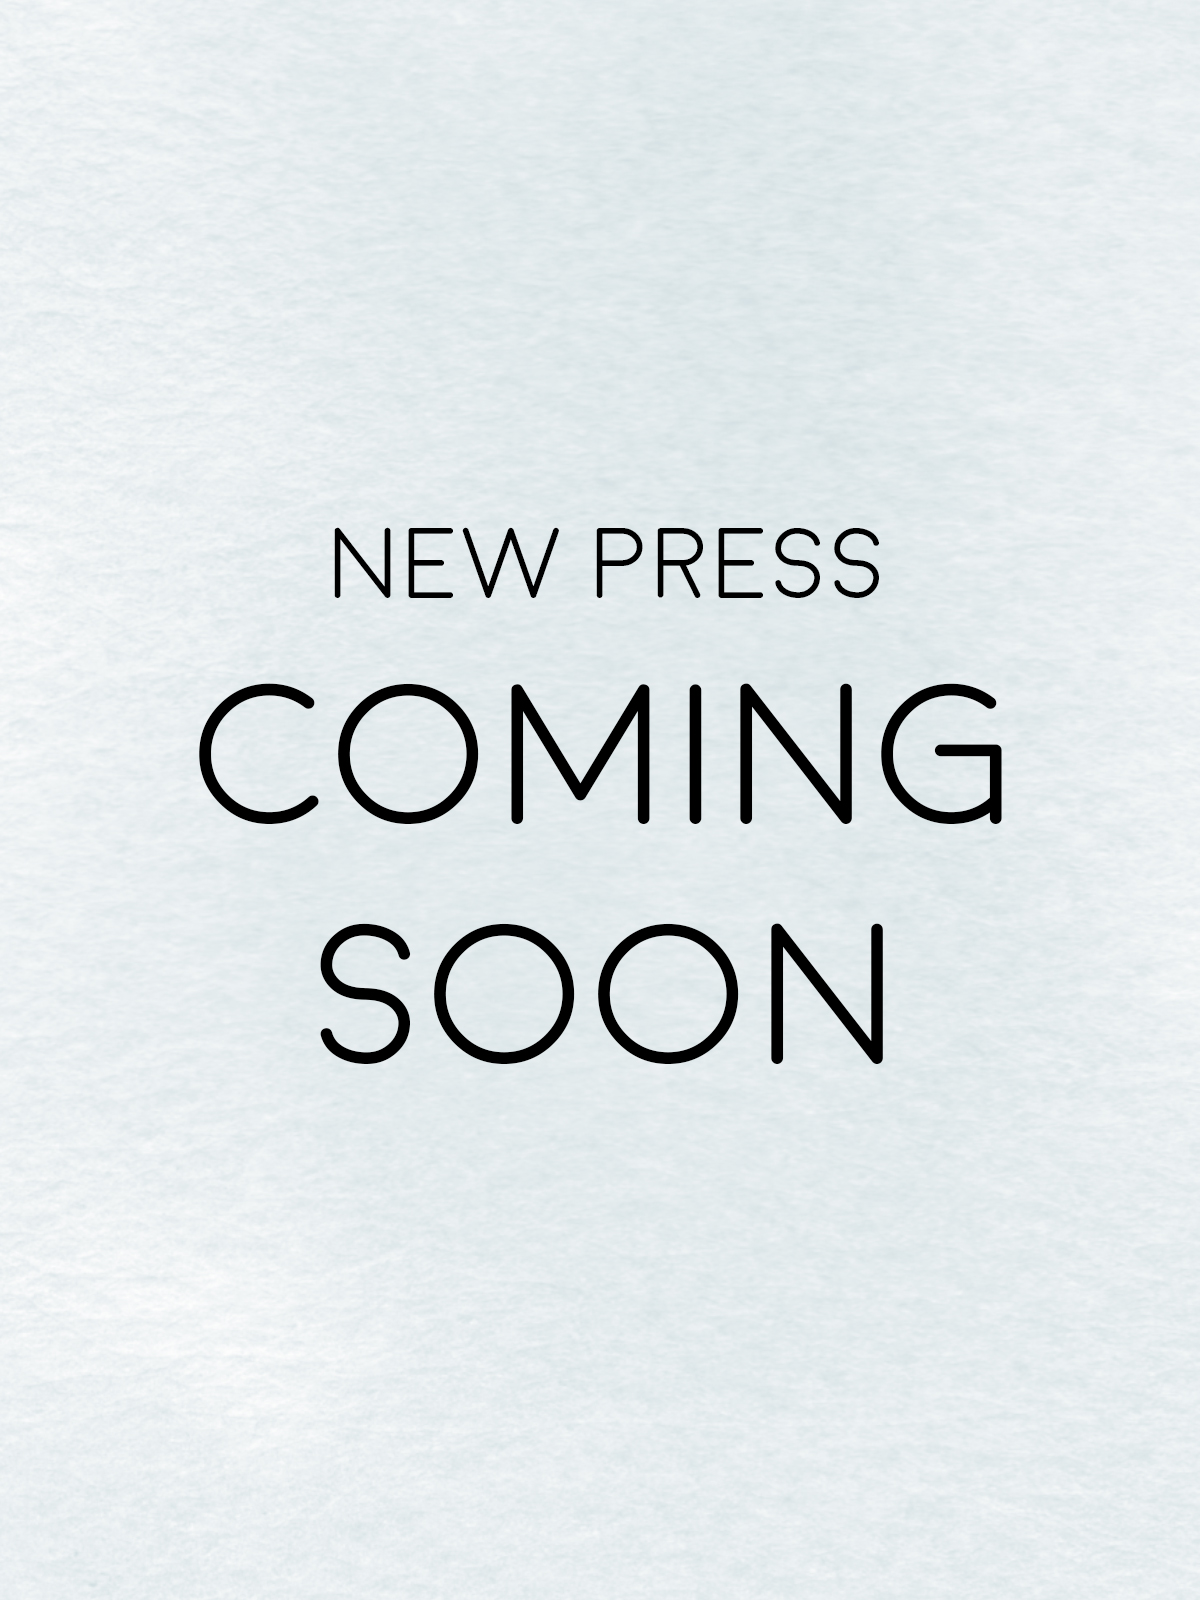 blackband_design_new_press